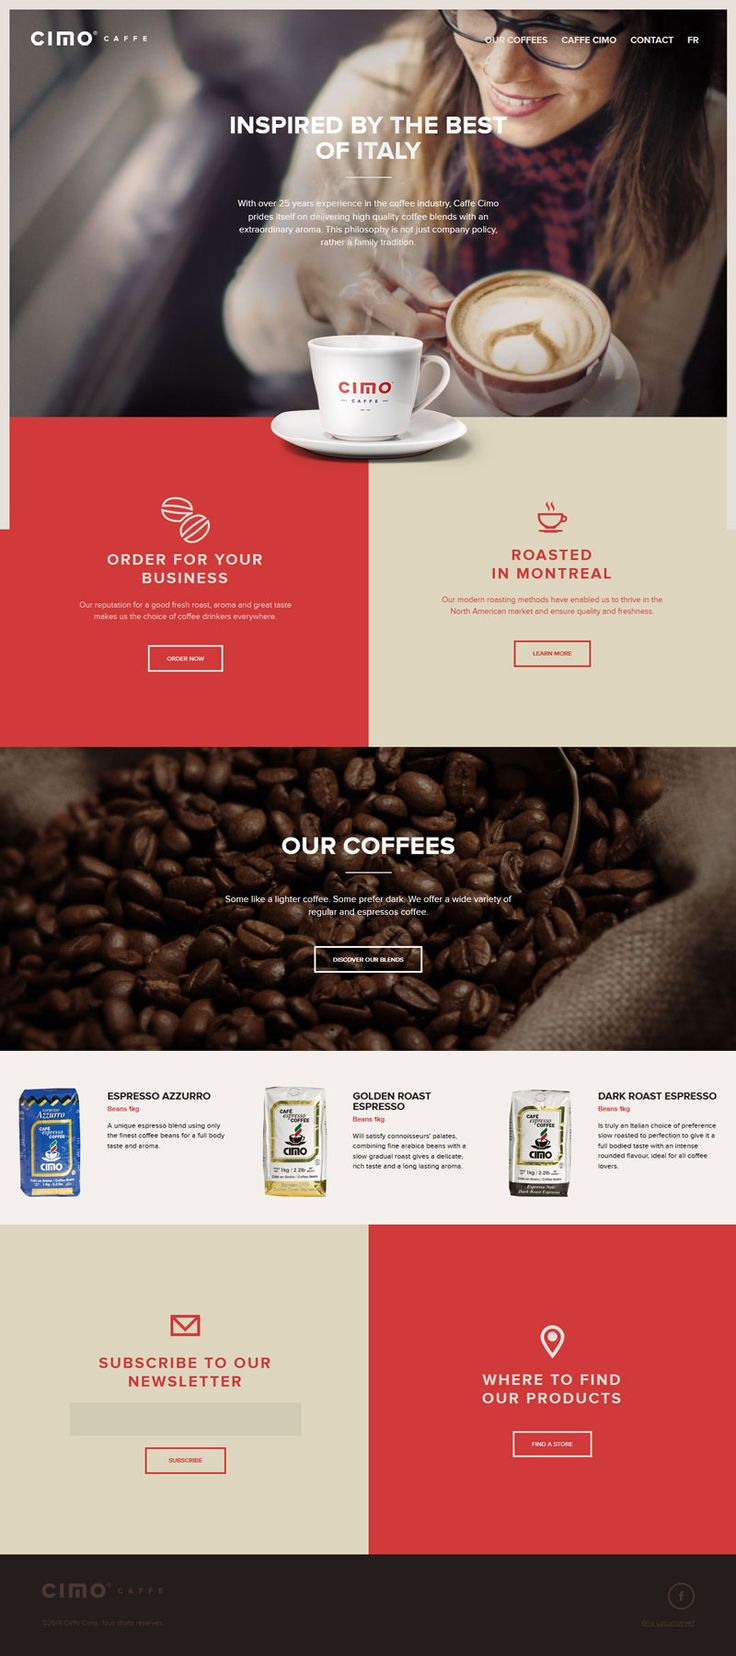 Caffe Cimo - Flat Design